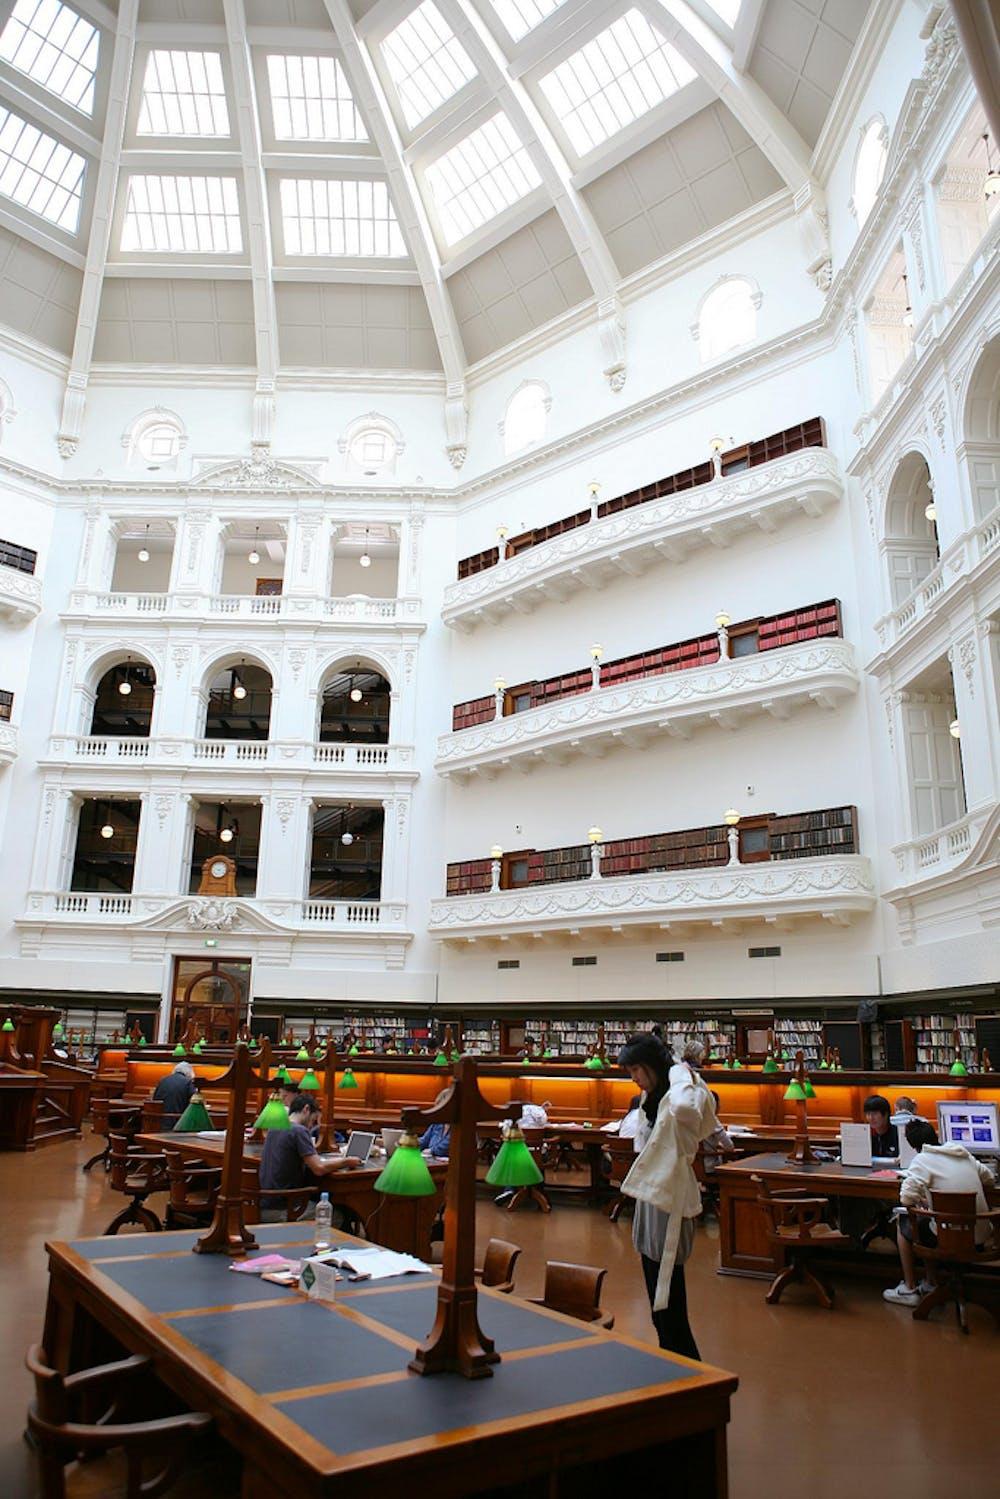 State Library Of Victoria Melbourne Cam Incoll